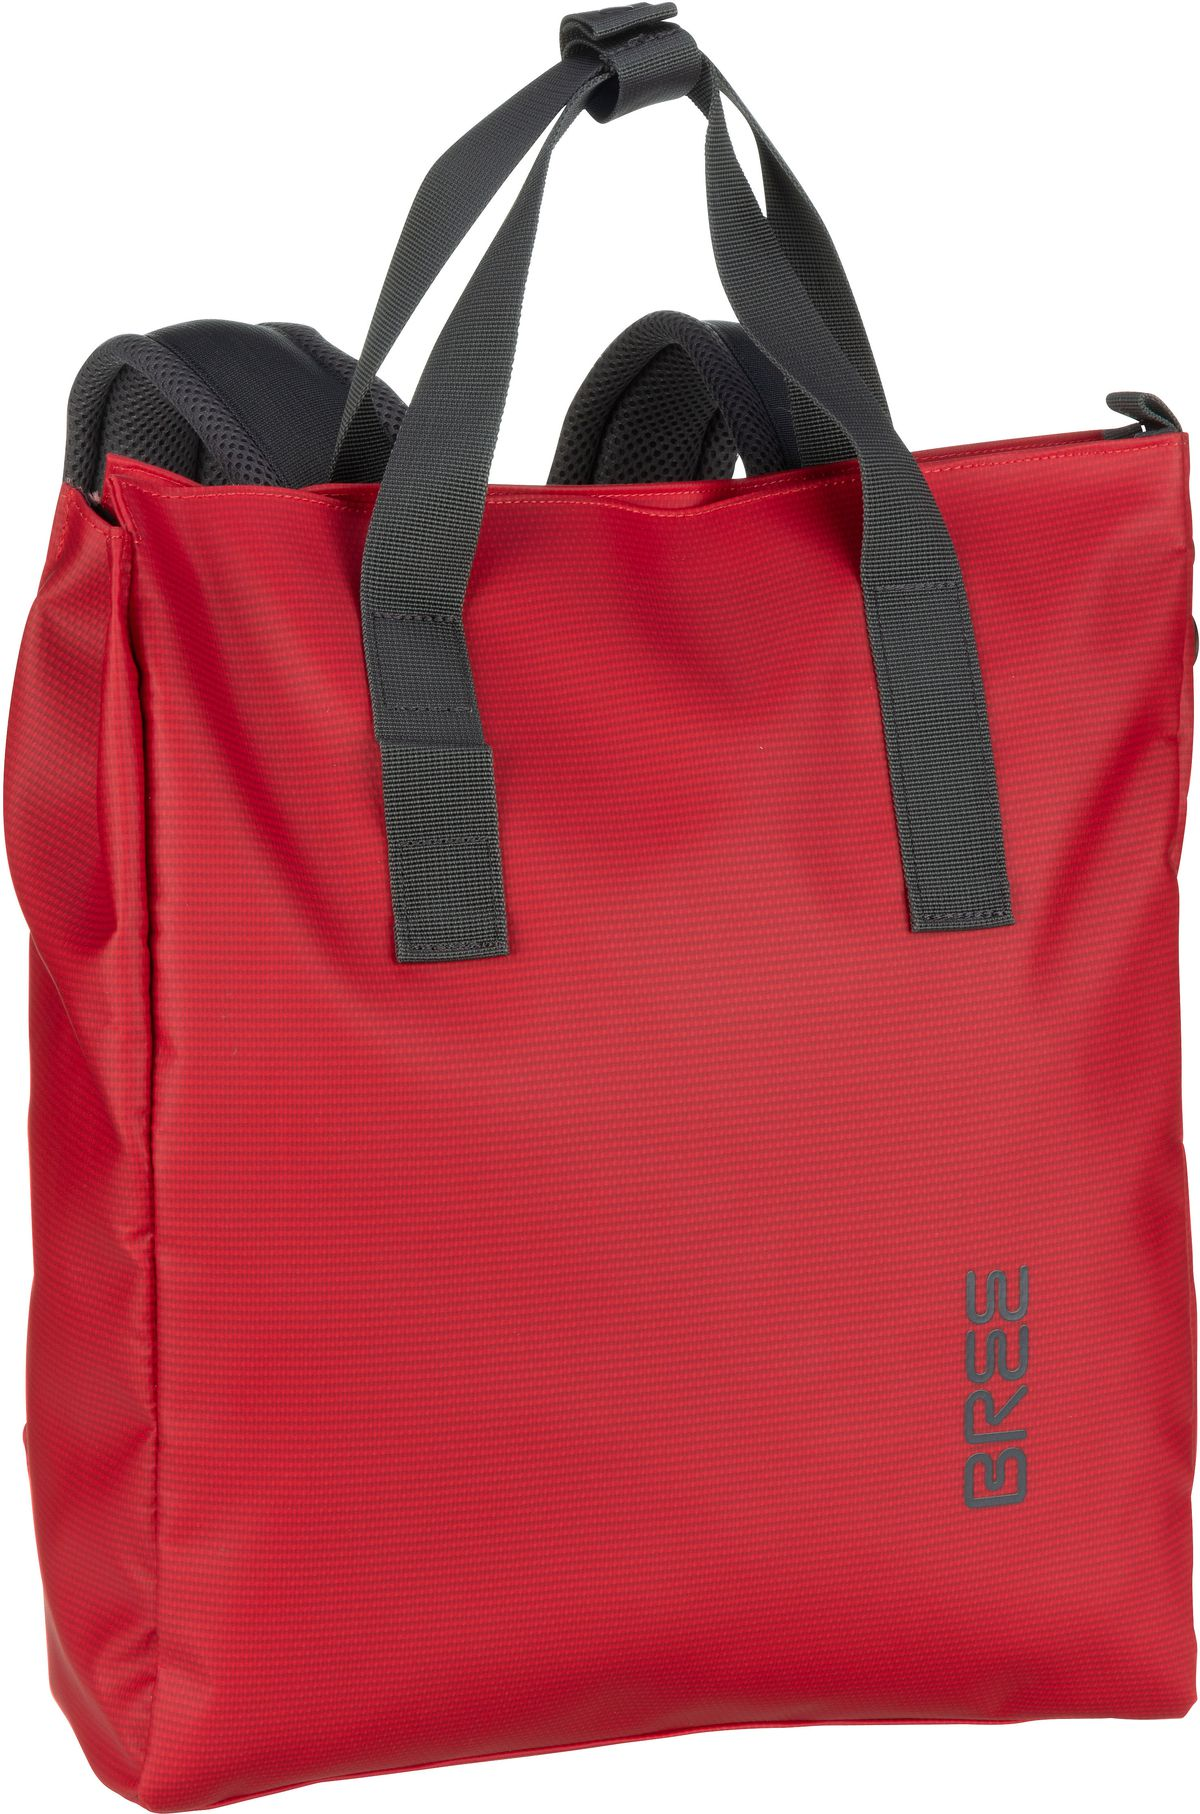 Rucksack / Daypack Punch 732 Red (15 Liter)